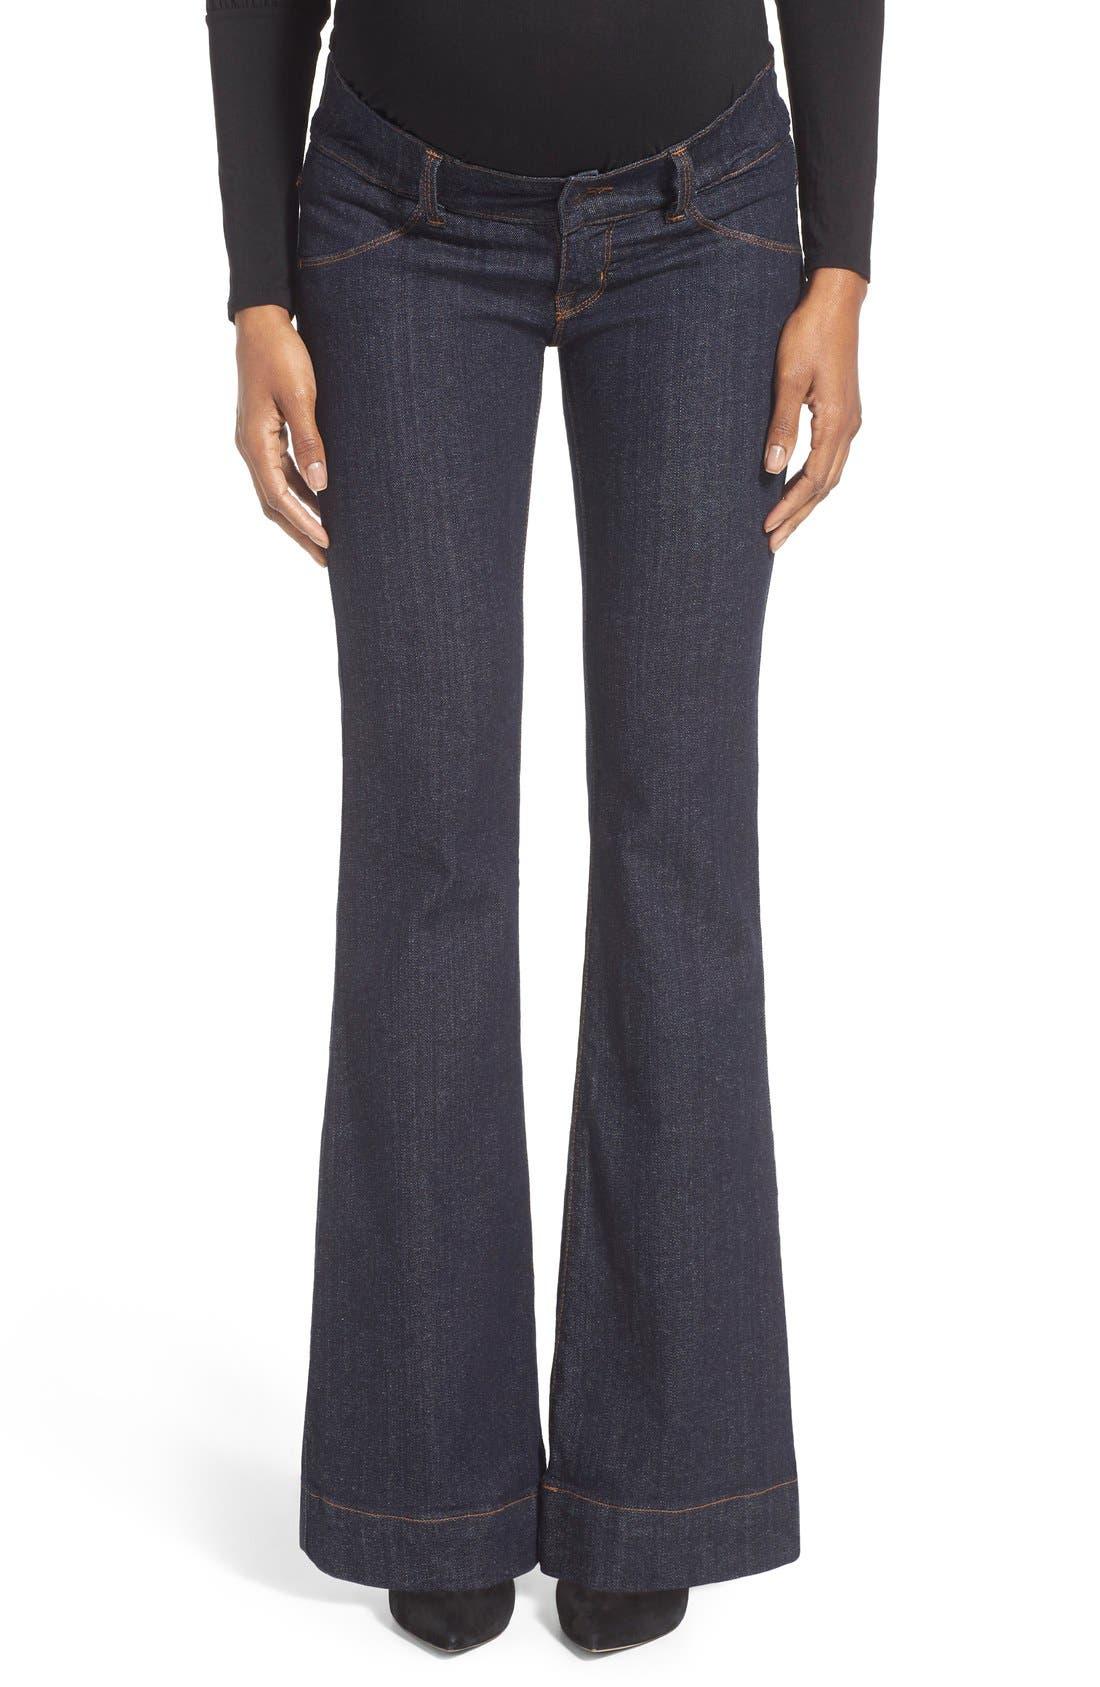 Maternal America Bootcut Stretch Maternity Jeans